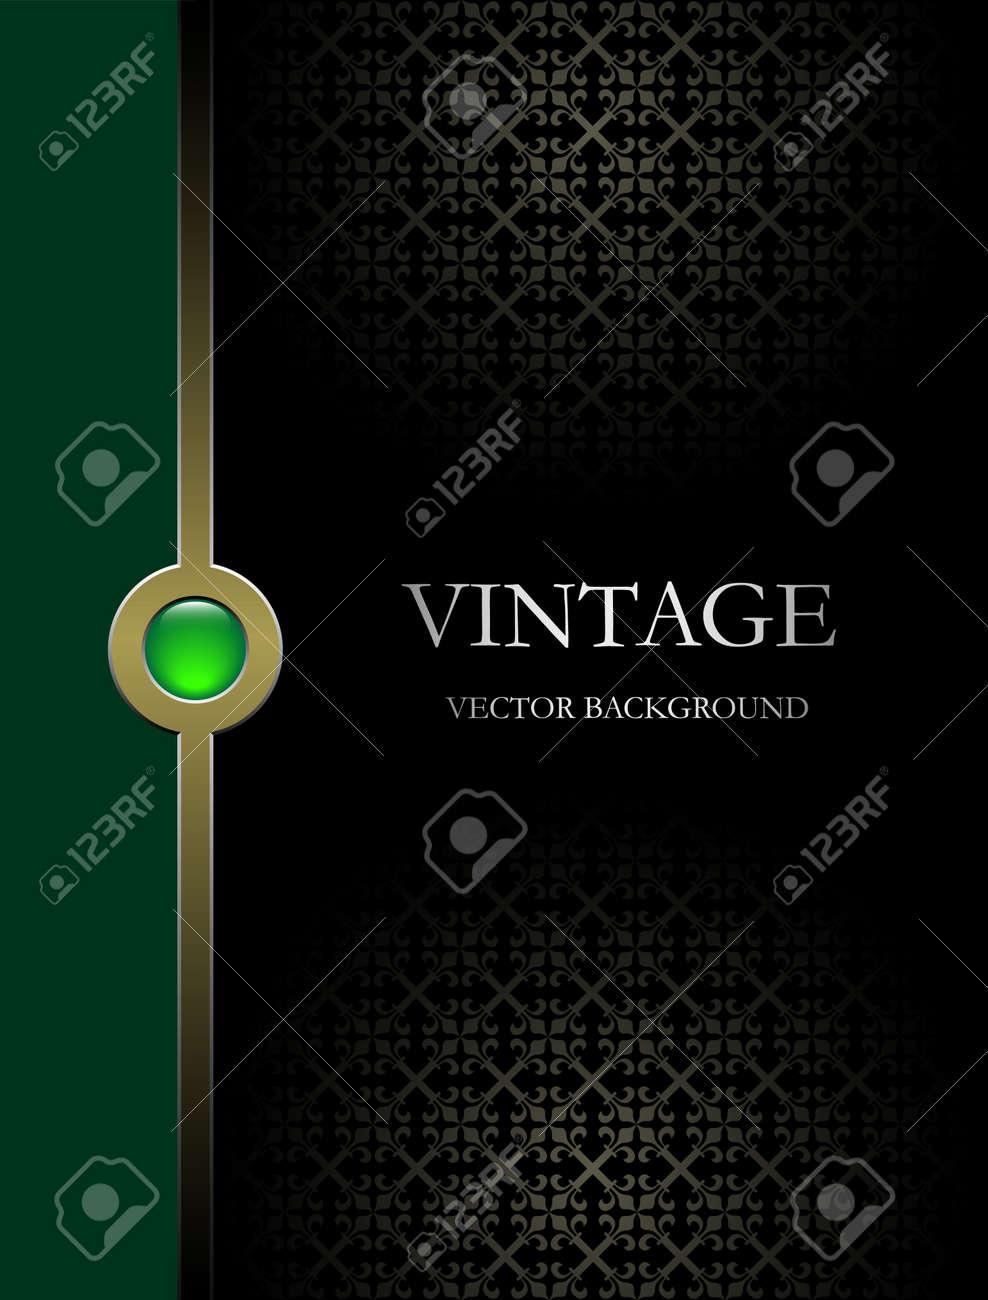 Vintage vector background Stock Vector - 11030602